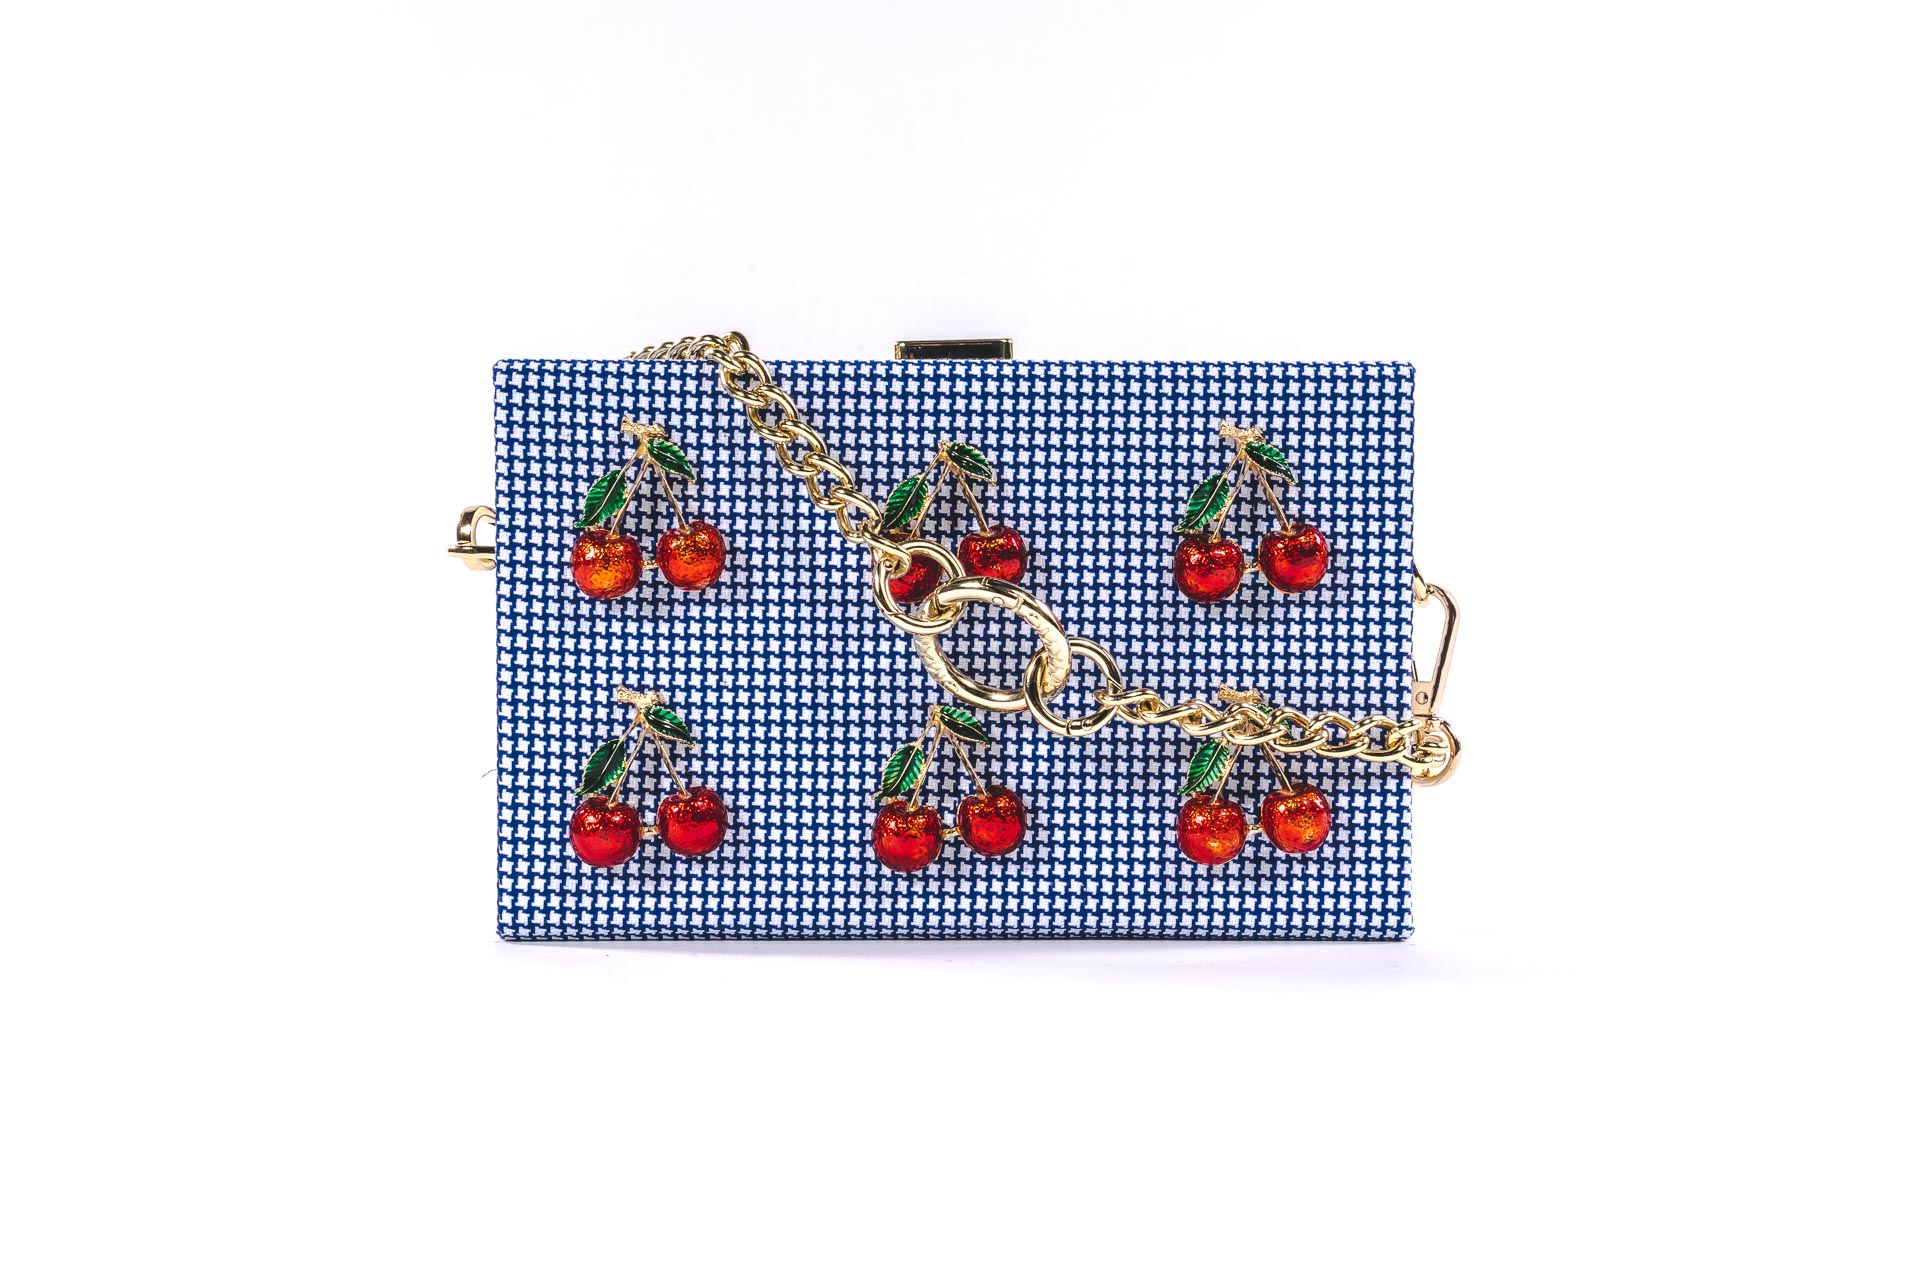 Cherries on top